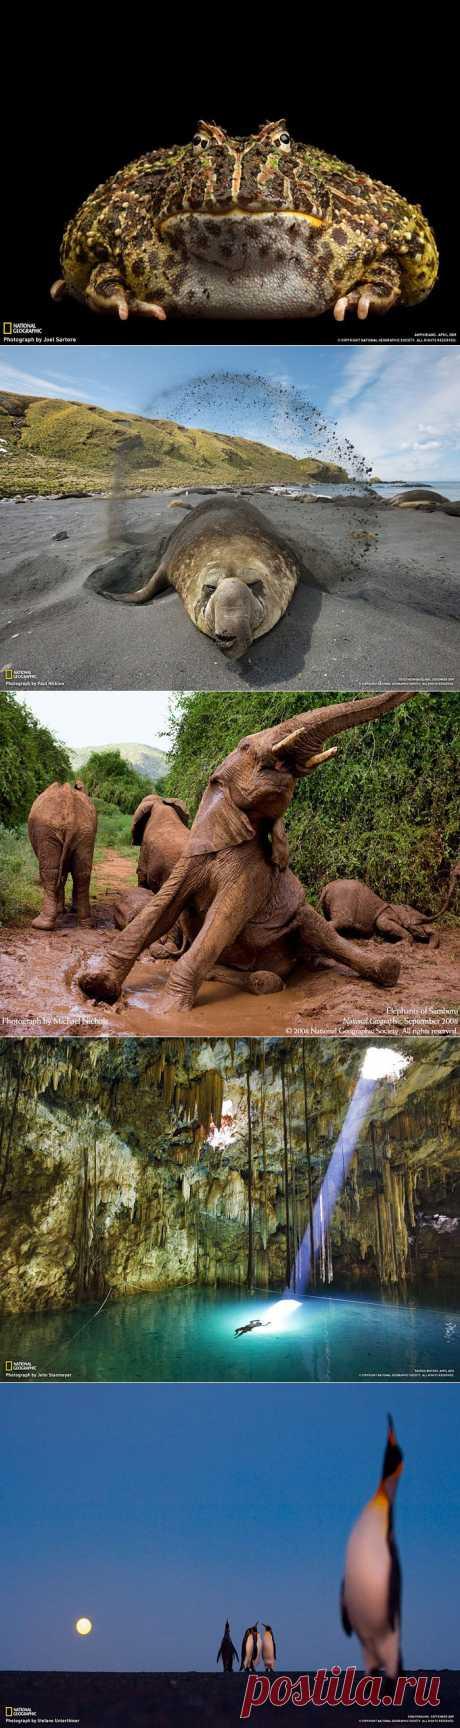 Из коллекции National Geographic..